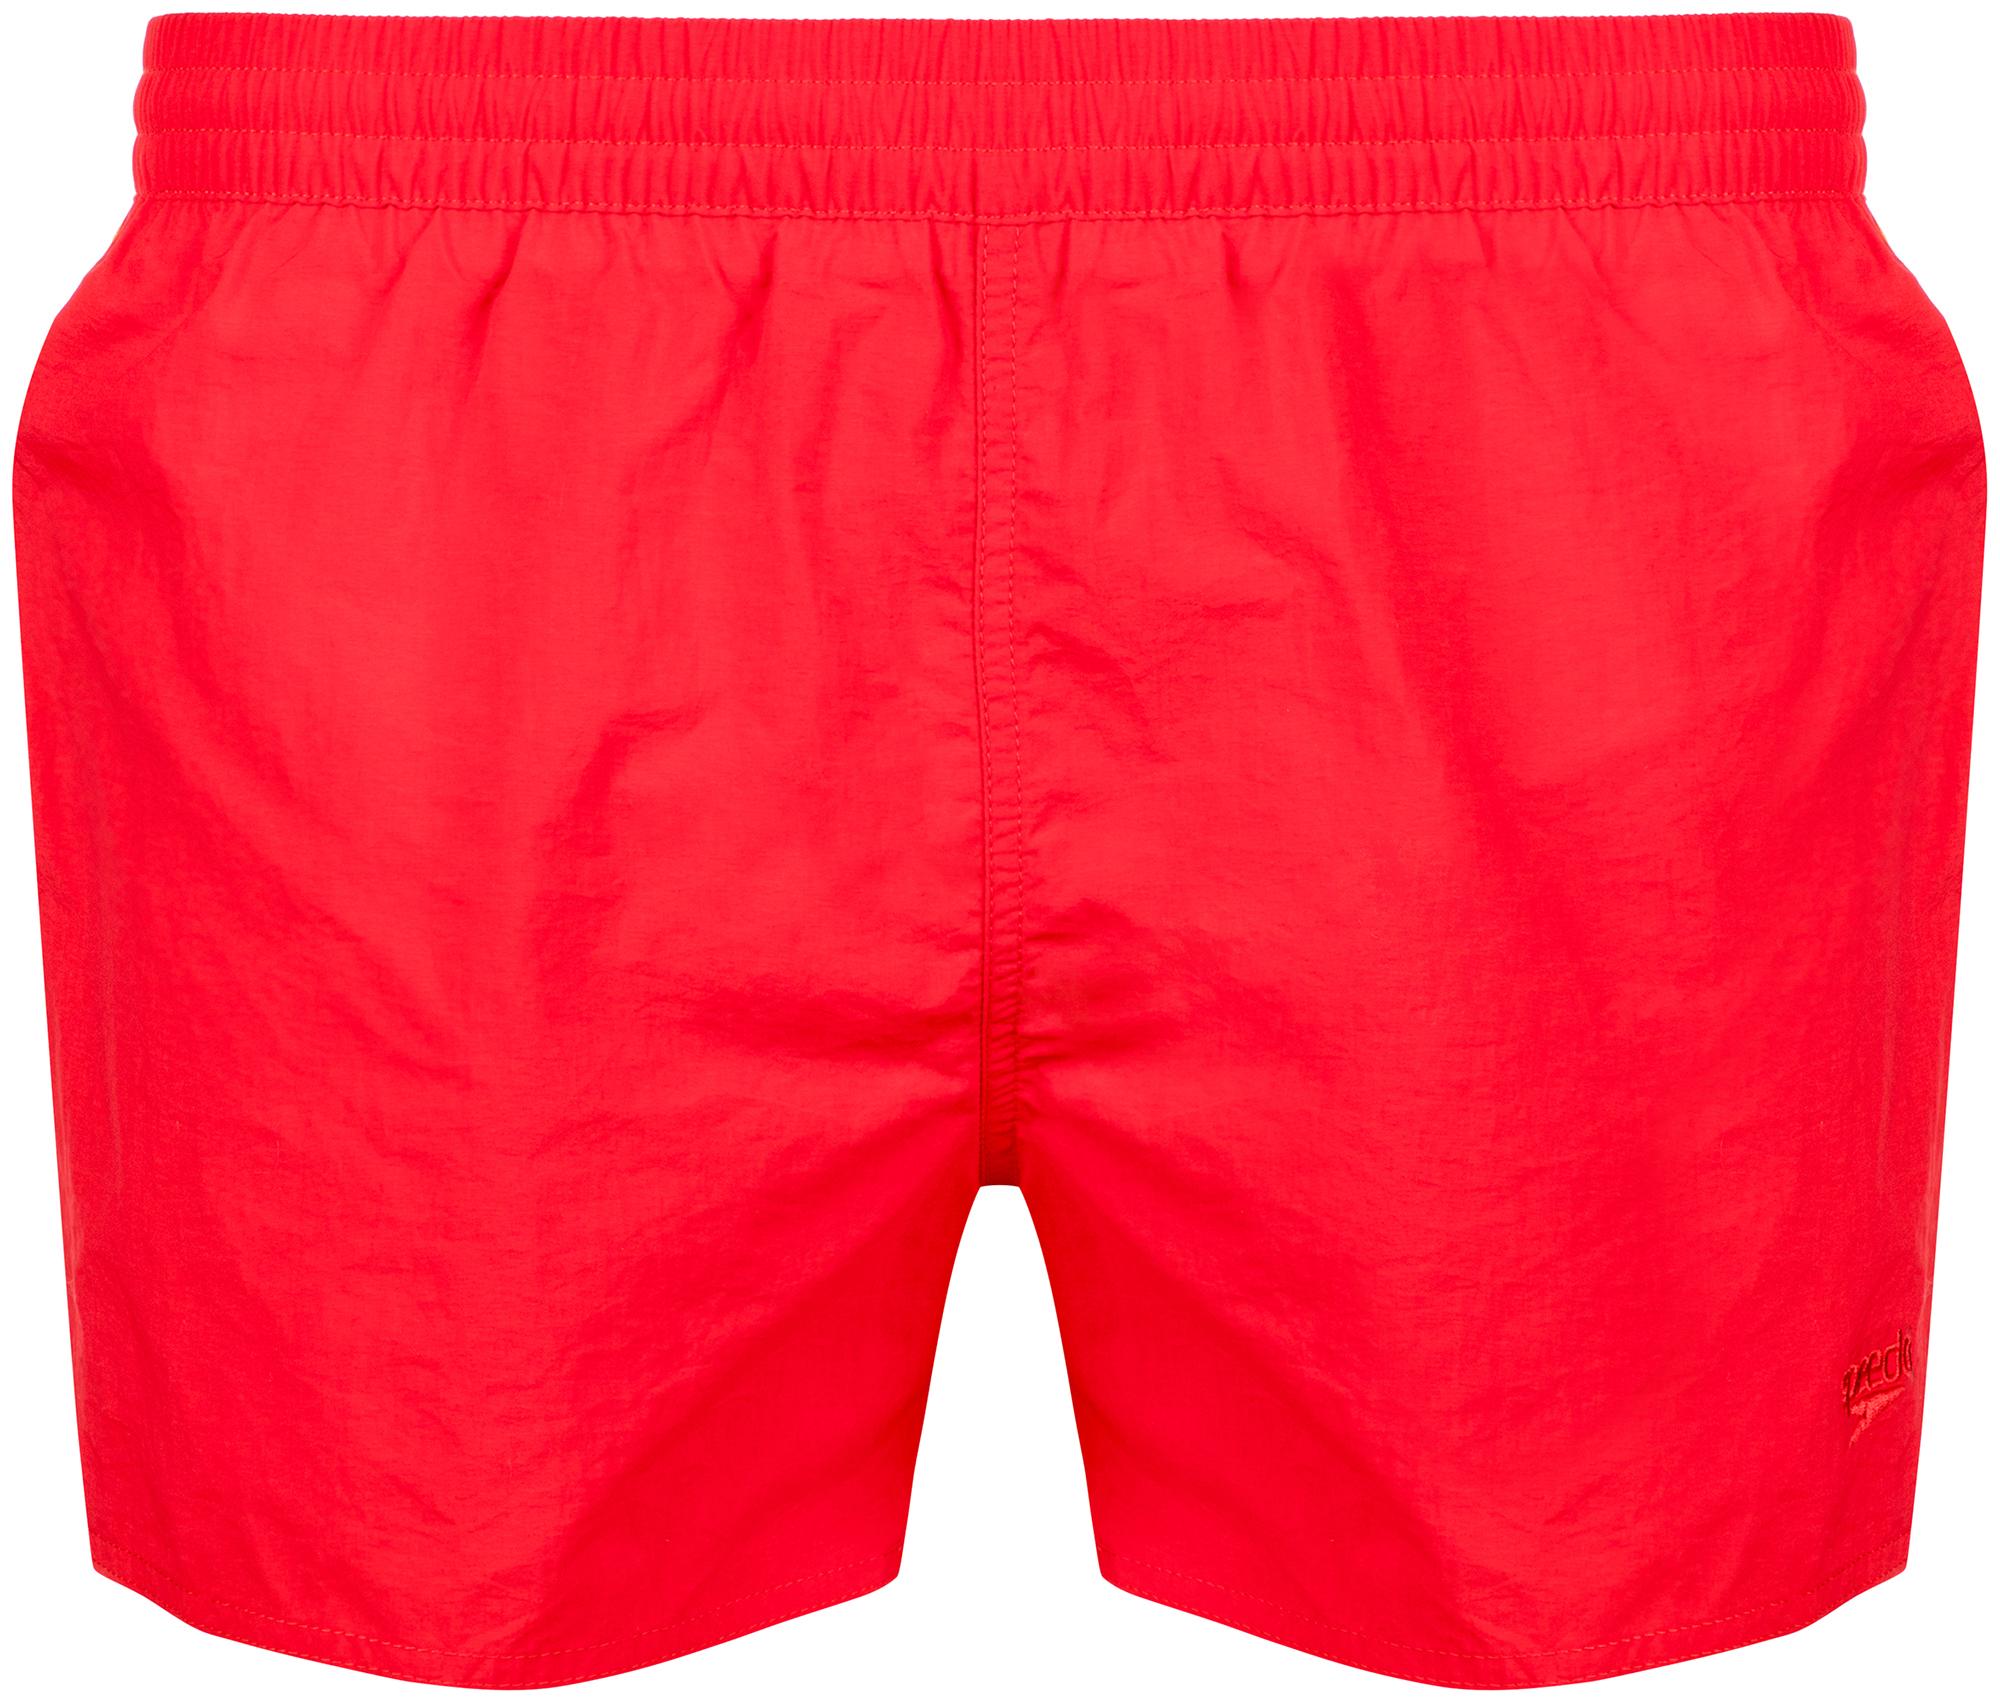 Speedo Шорты плавательные мужские Speedo Retro 13, размер 50-52